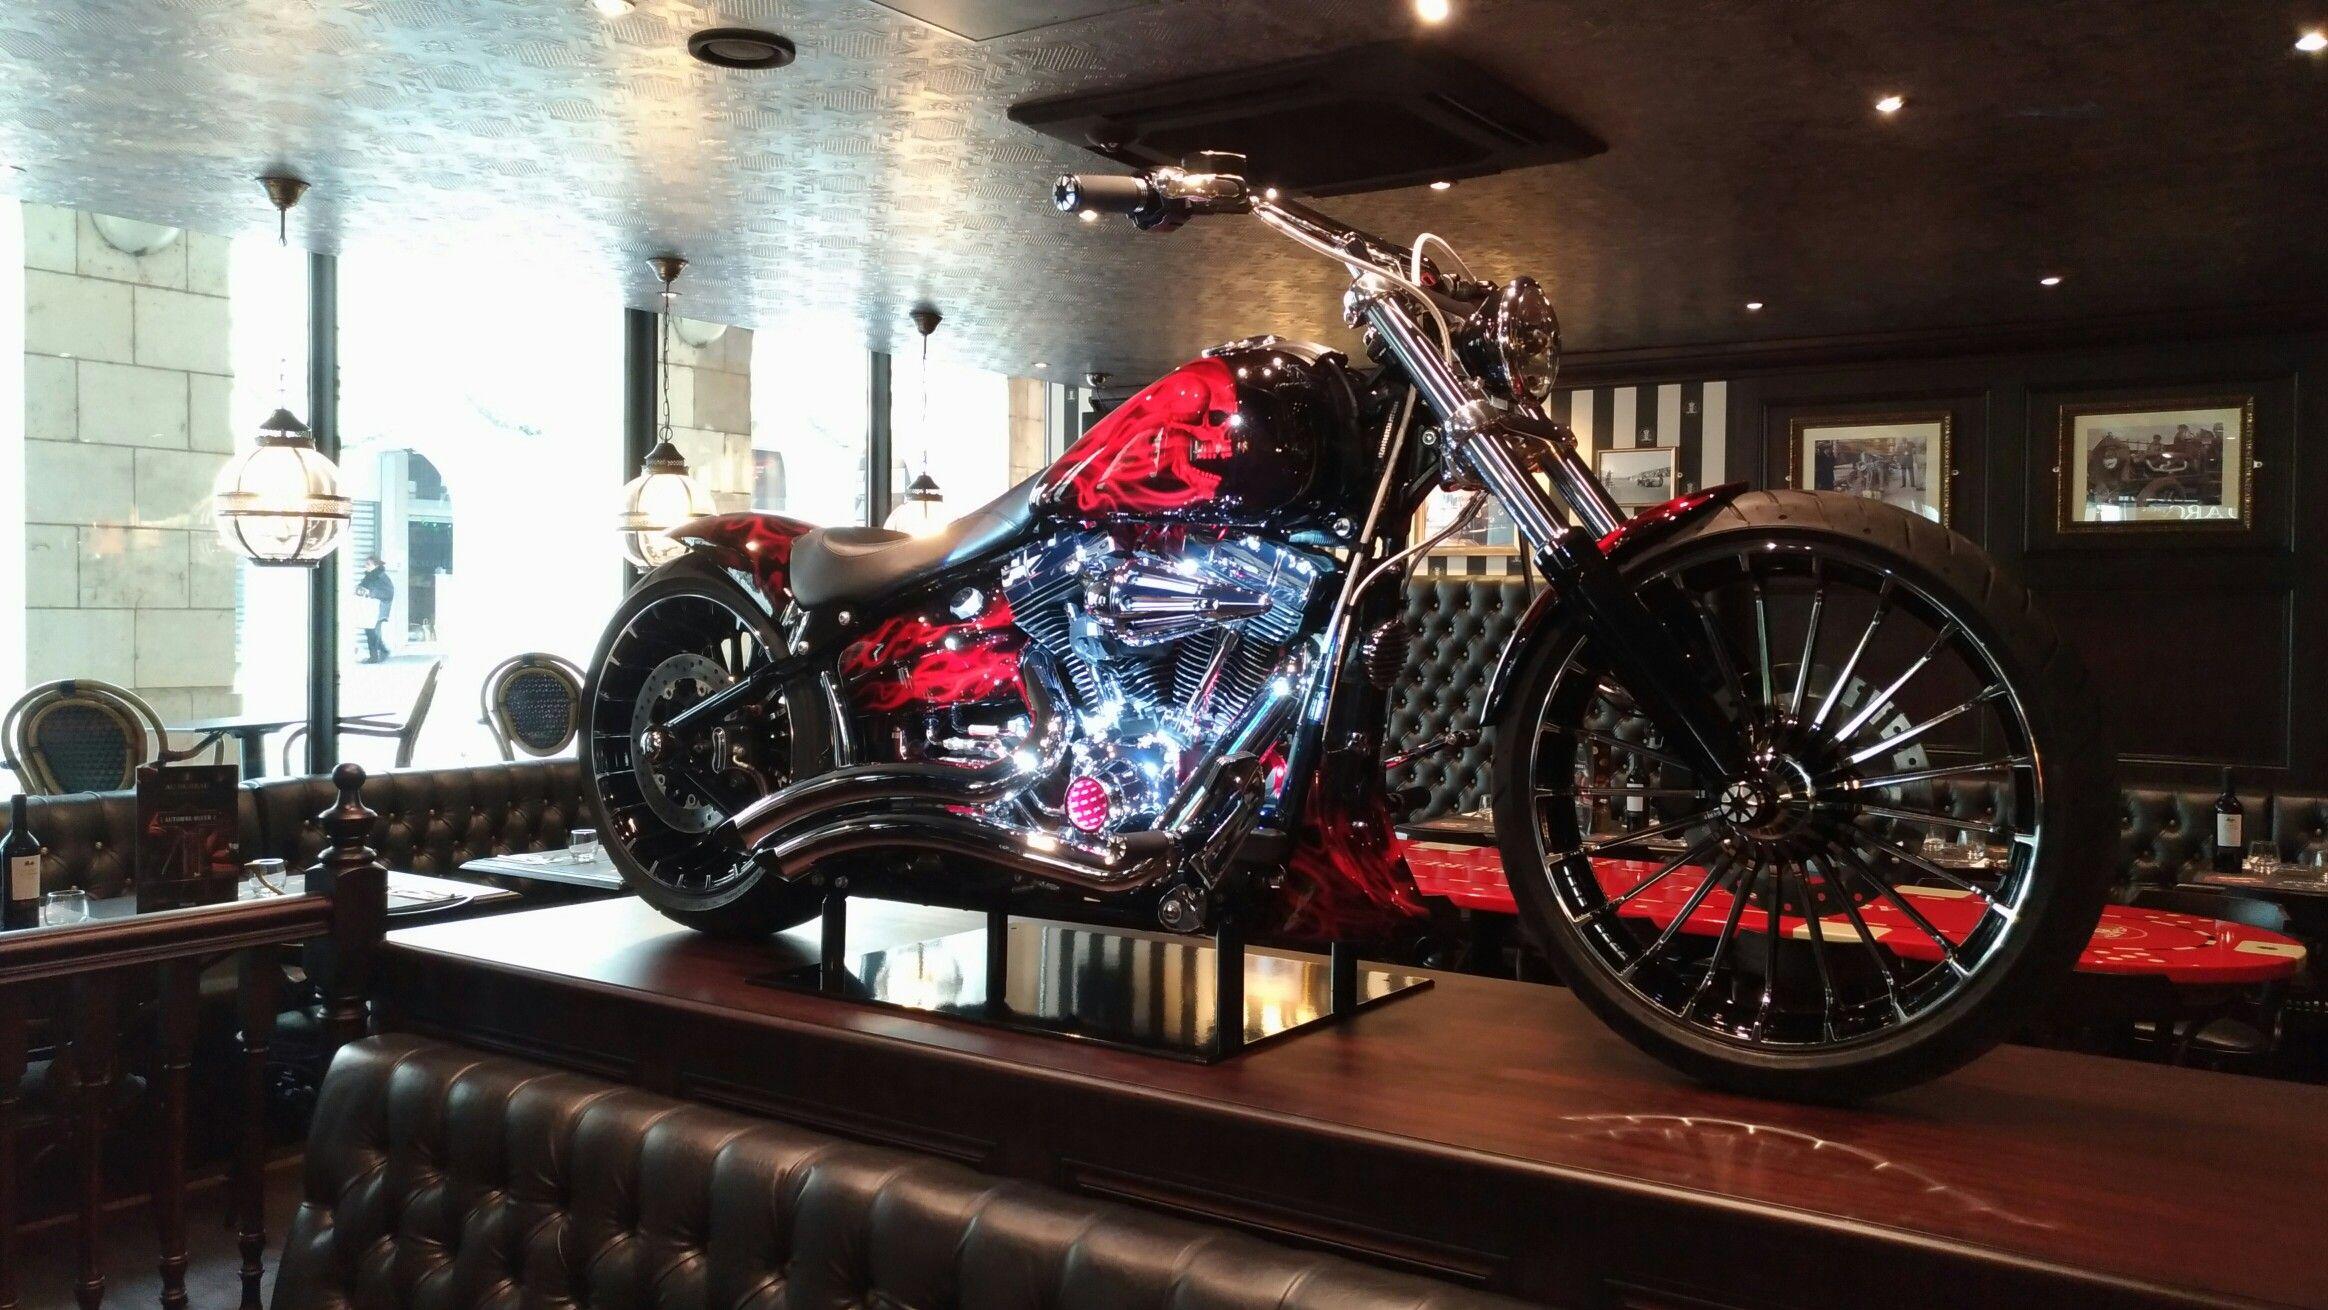 Harley breakout custom hd borie pub au bureau orlÉans harley